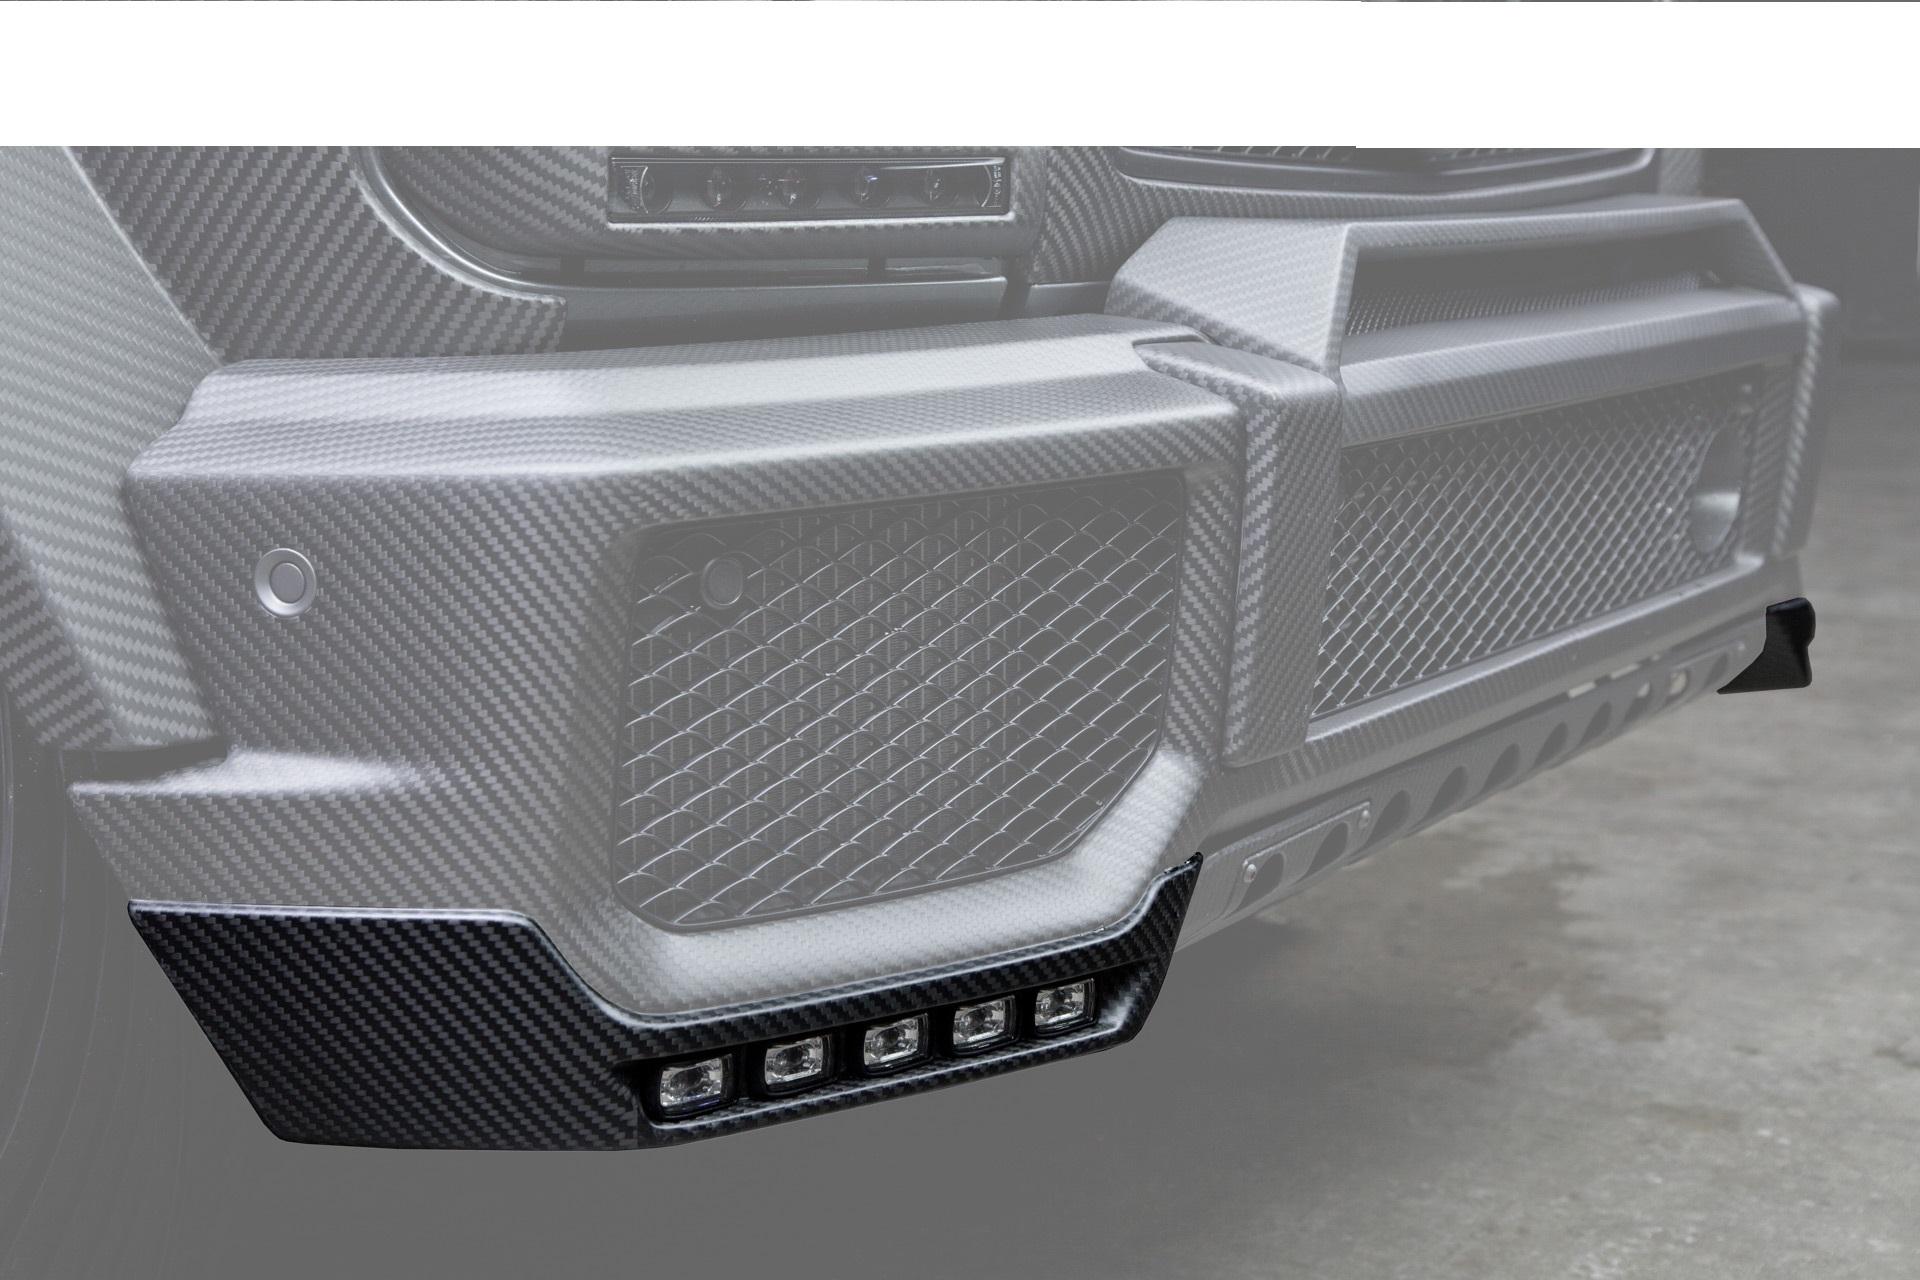 Hodoor Performance Carbon fiber front bumper lip Brabus Style for Mercedes G-class W463